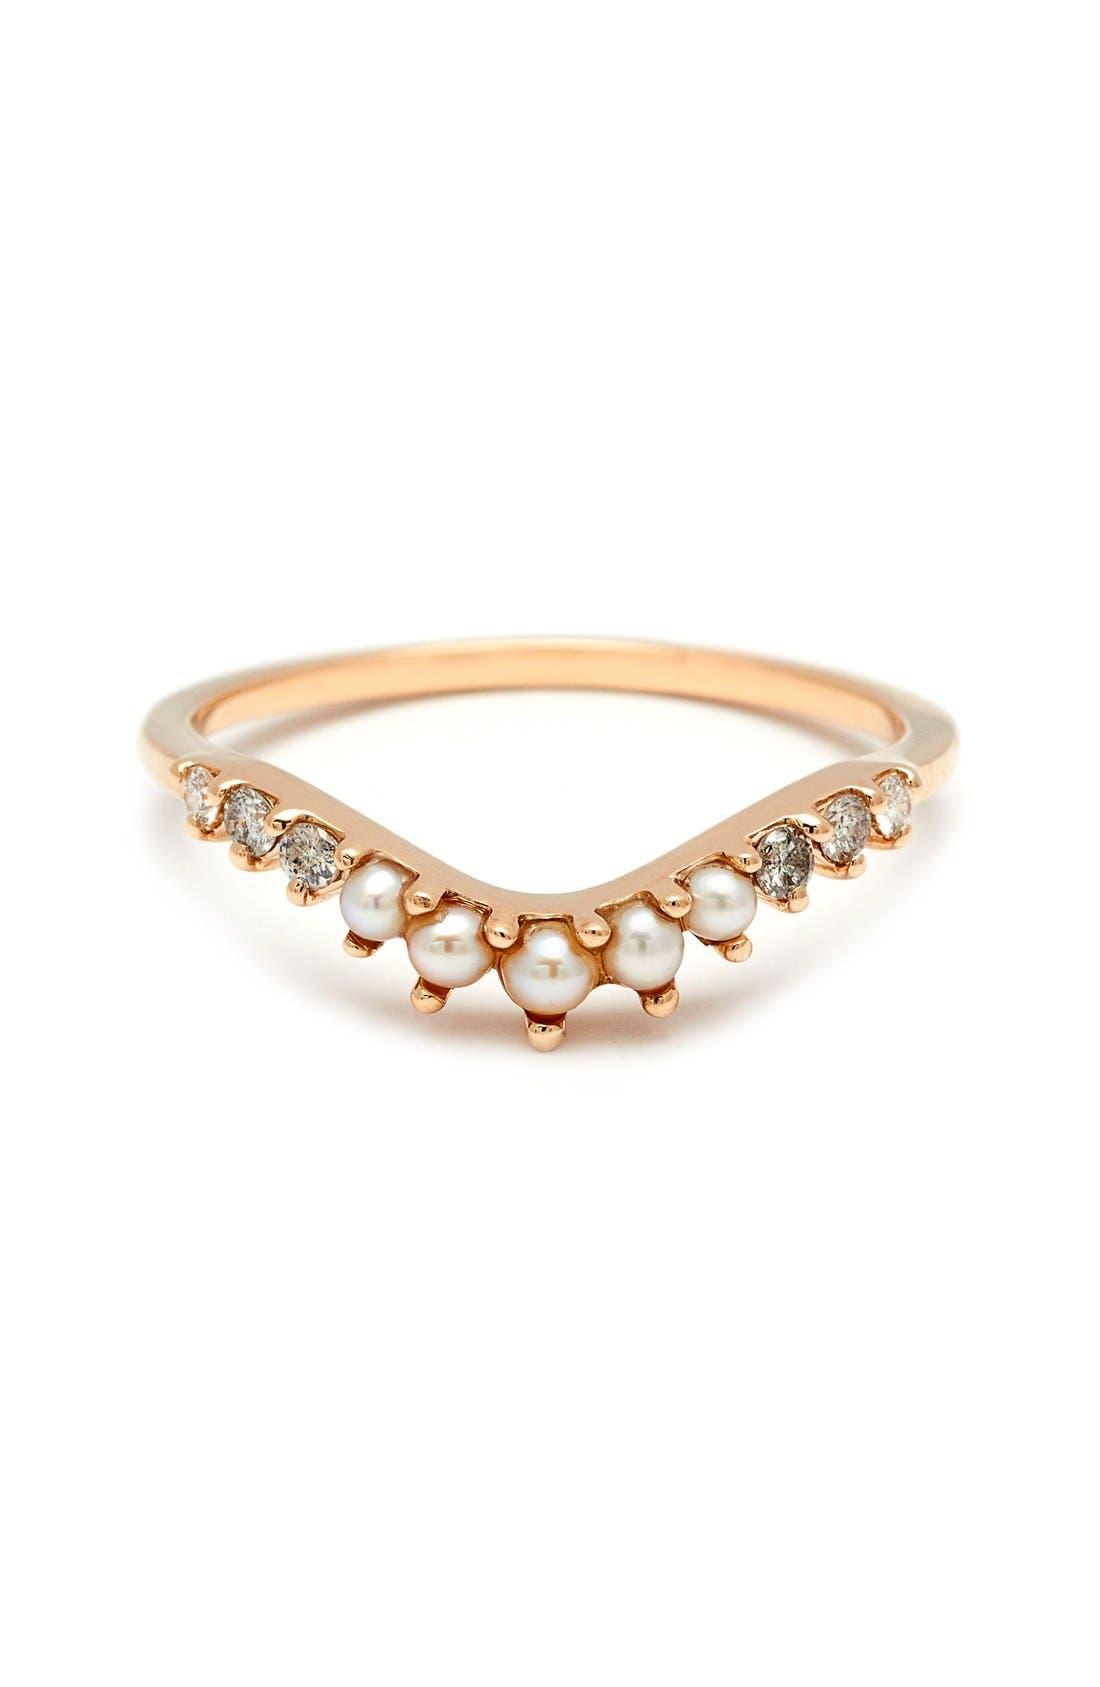 Alternate Image 1 Selected - Anna Sheffield 'Tiara Curve' Diamond & Seed Pearl Ring